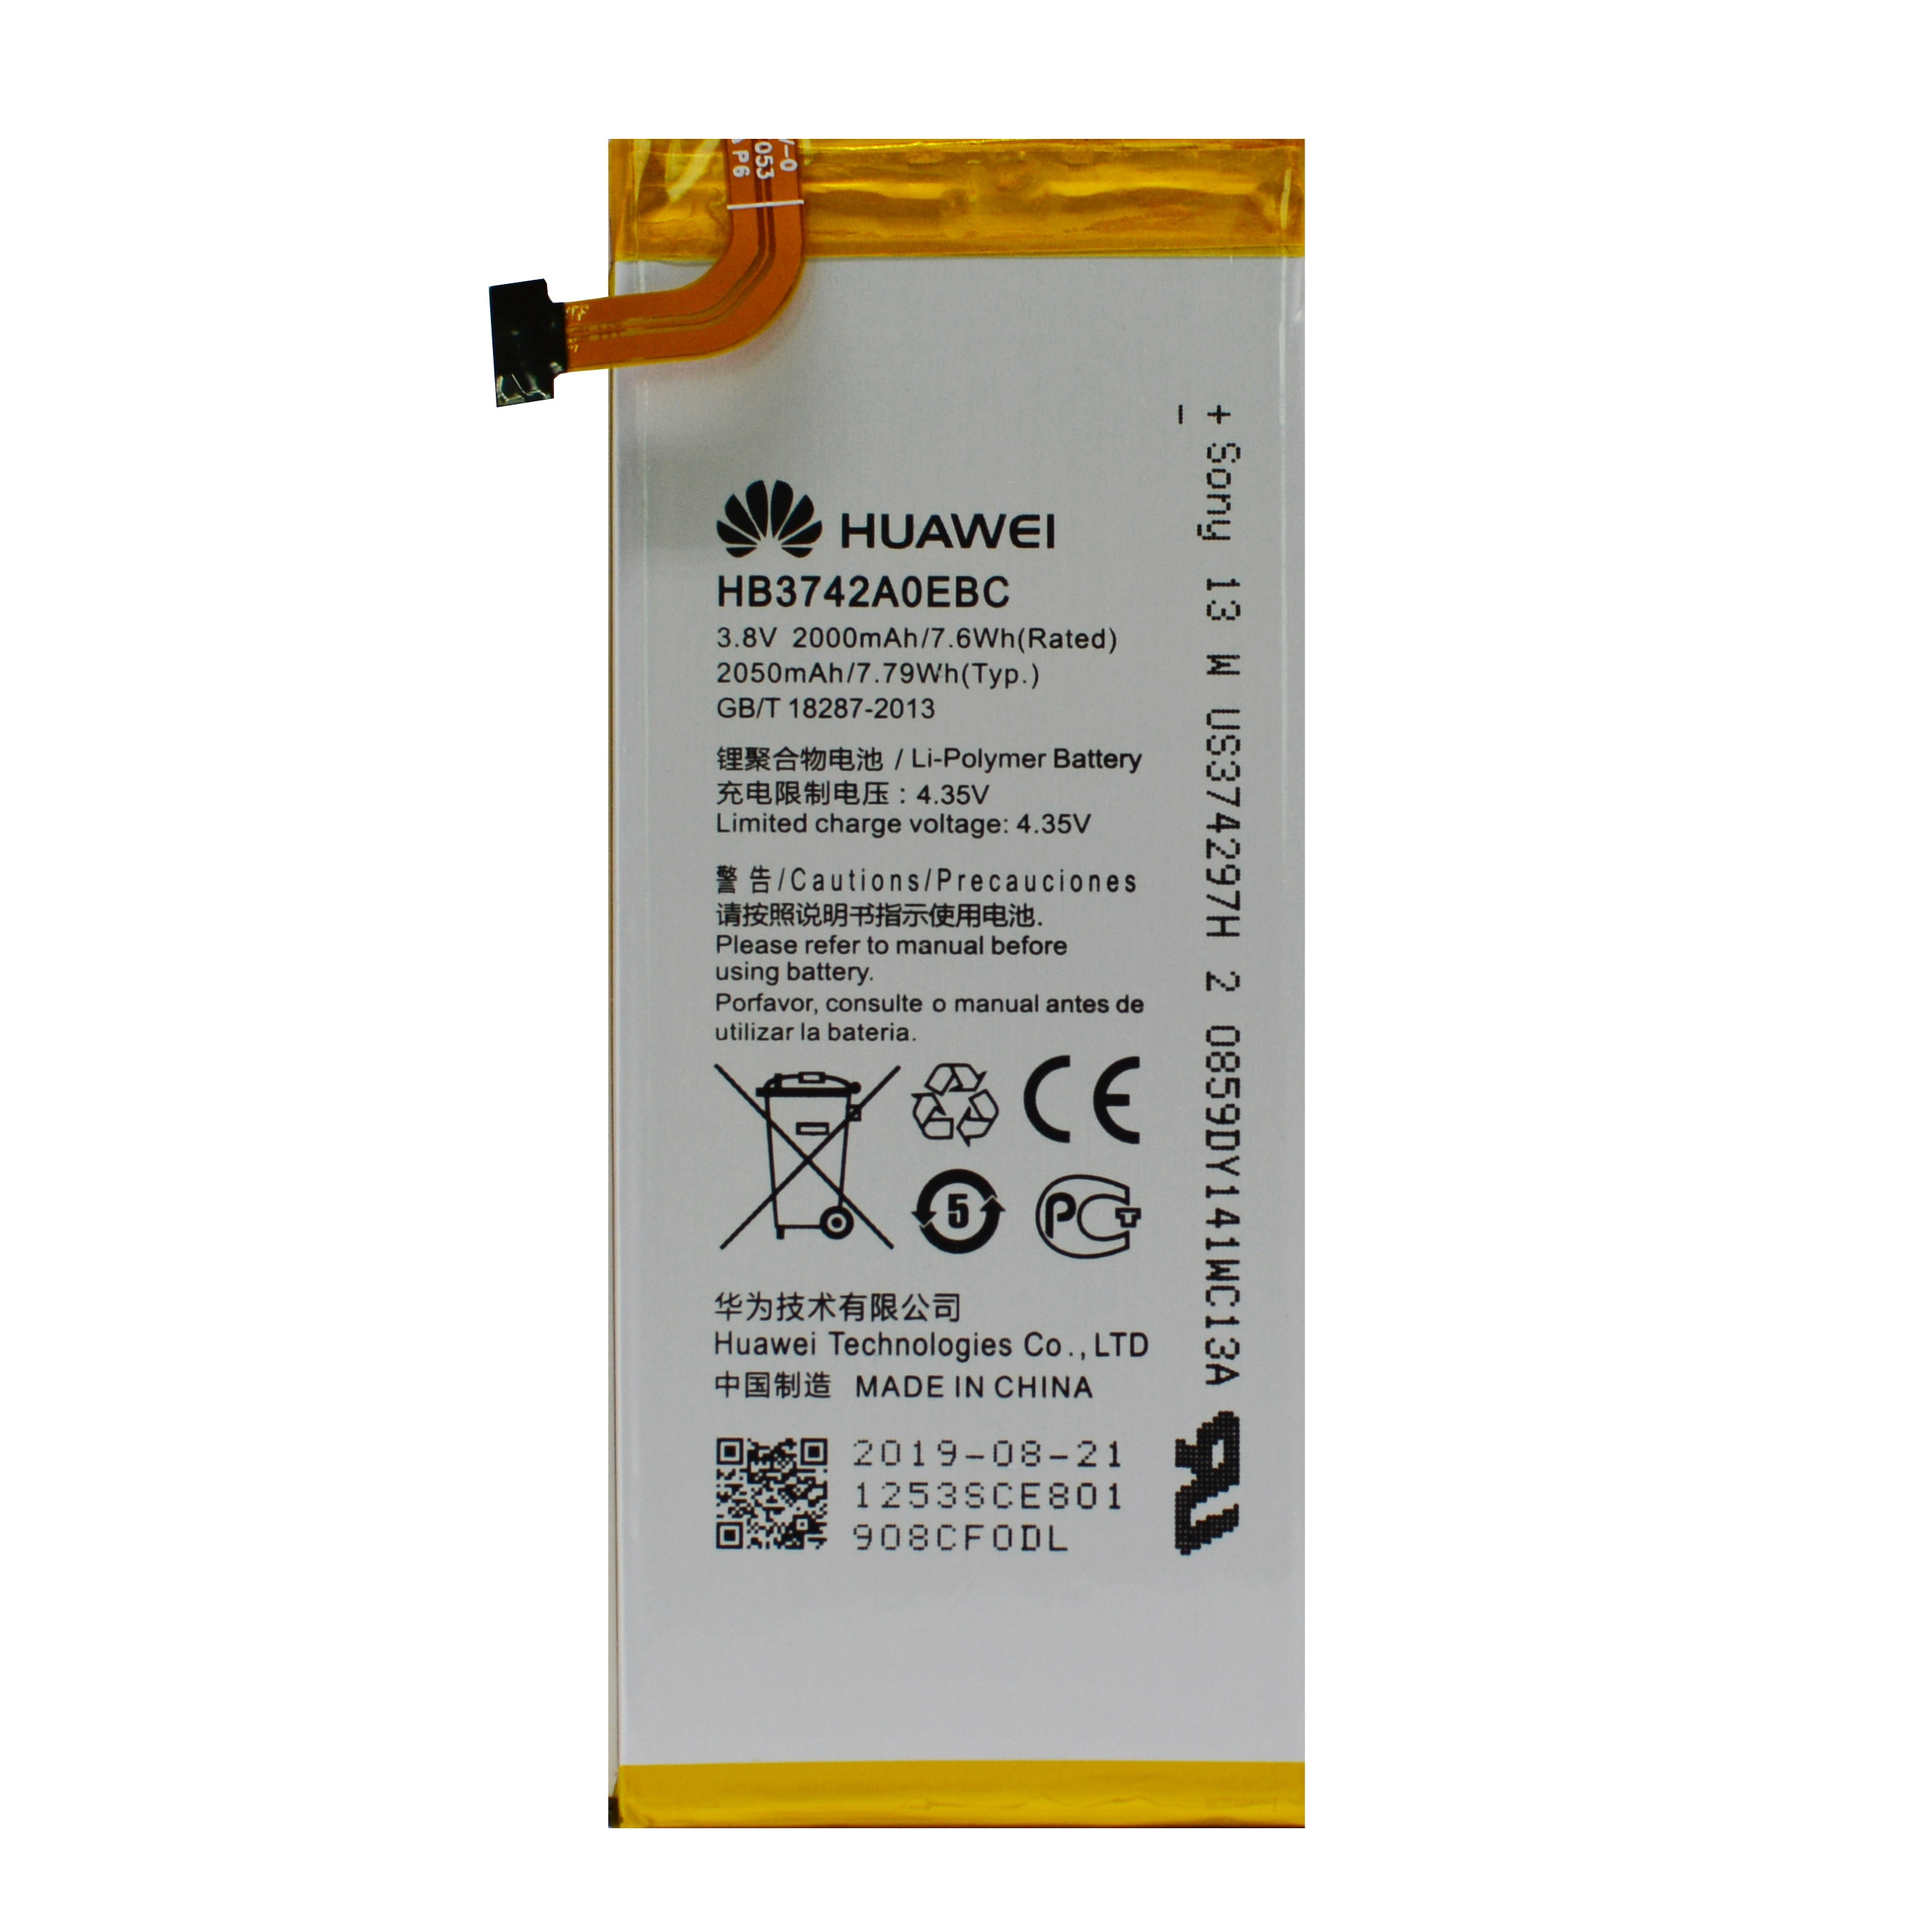 20pcs/lot Original Battery HB3742A0EBC For Huawei Ascend P6 P6-U06 p6-c00 p6-T00/ Ascend G6 G620 G621 G620s G630 2000mAh enlarge